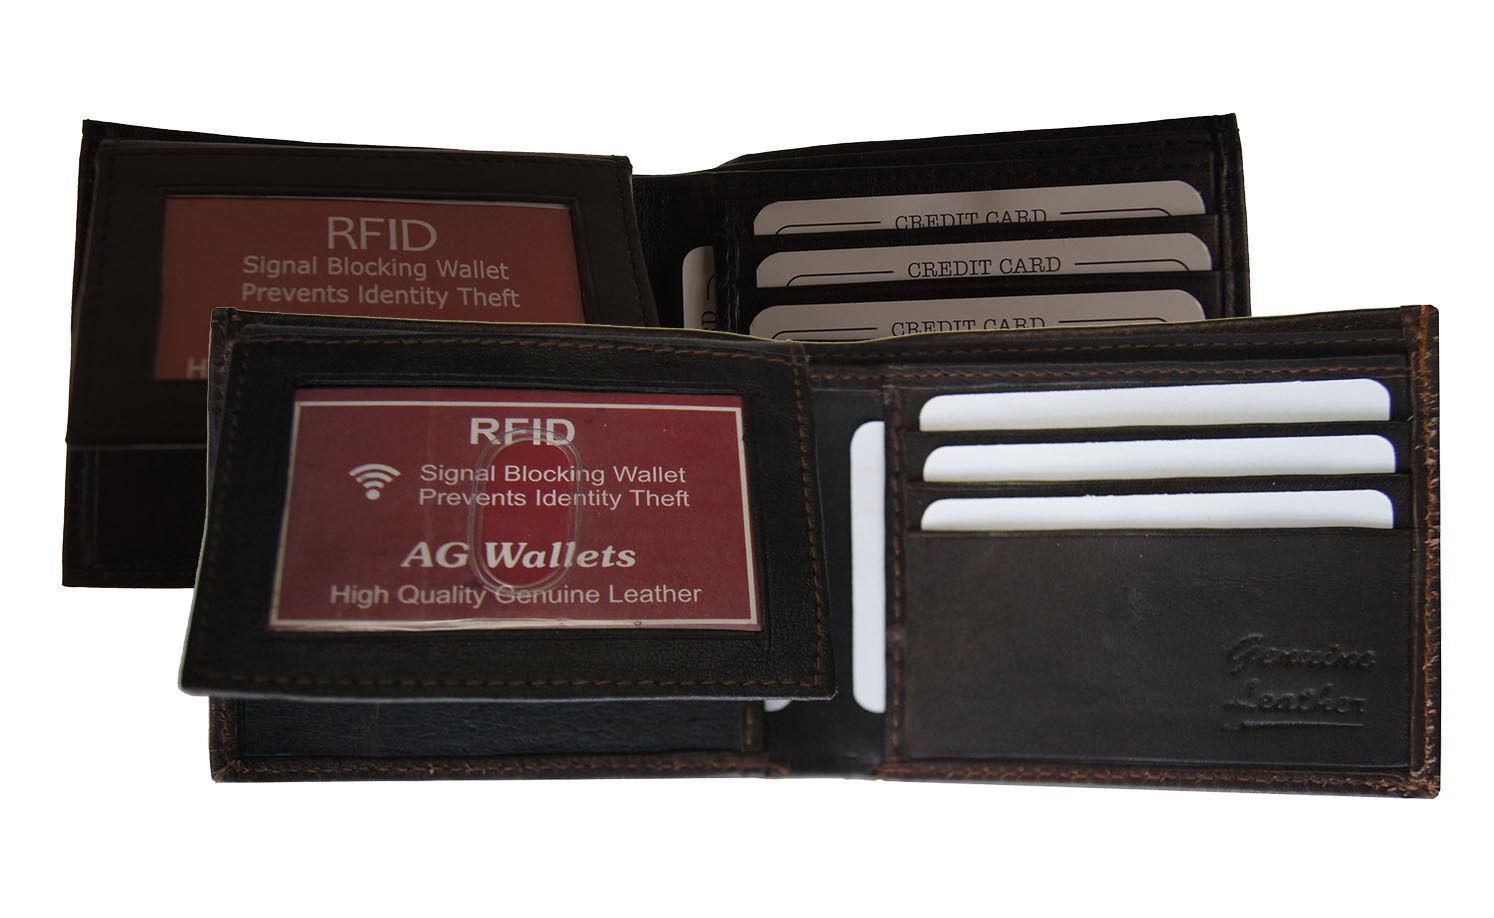 RFID Bifold Wallet - Genuine Leather, Flip Up ID, Multi Card Holder, Scan Proof